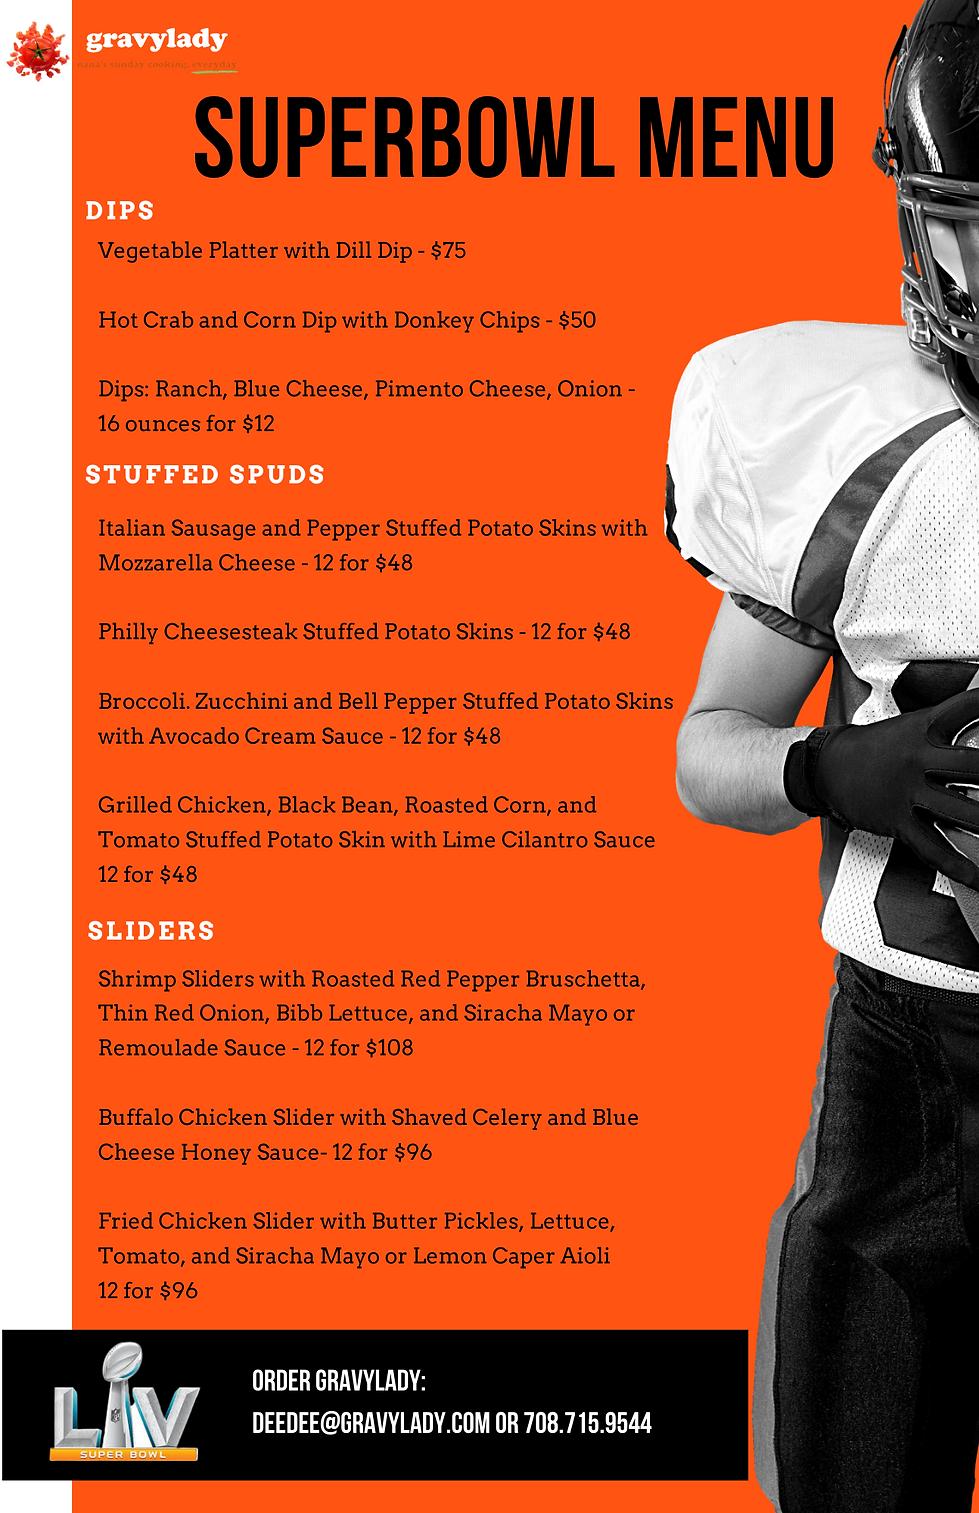 gravylady superbowl menu copy.png